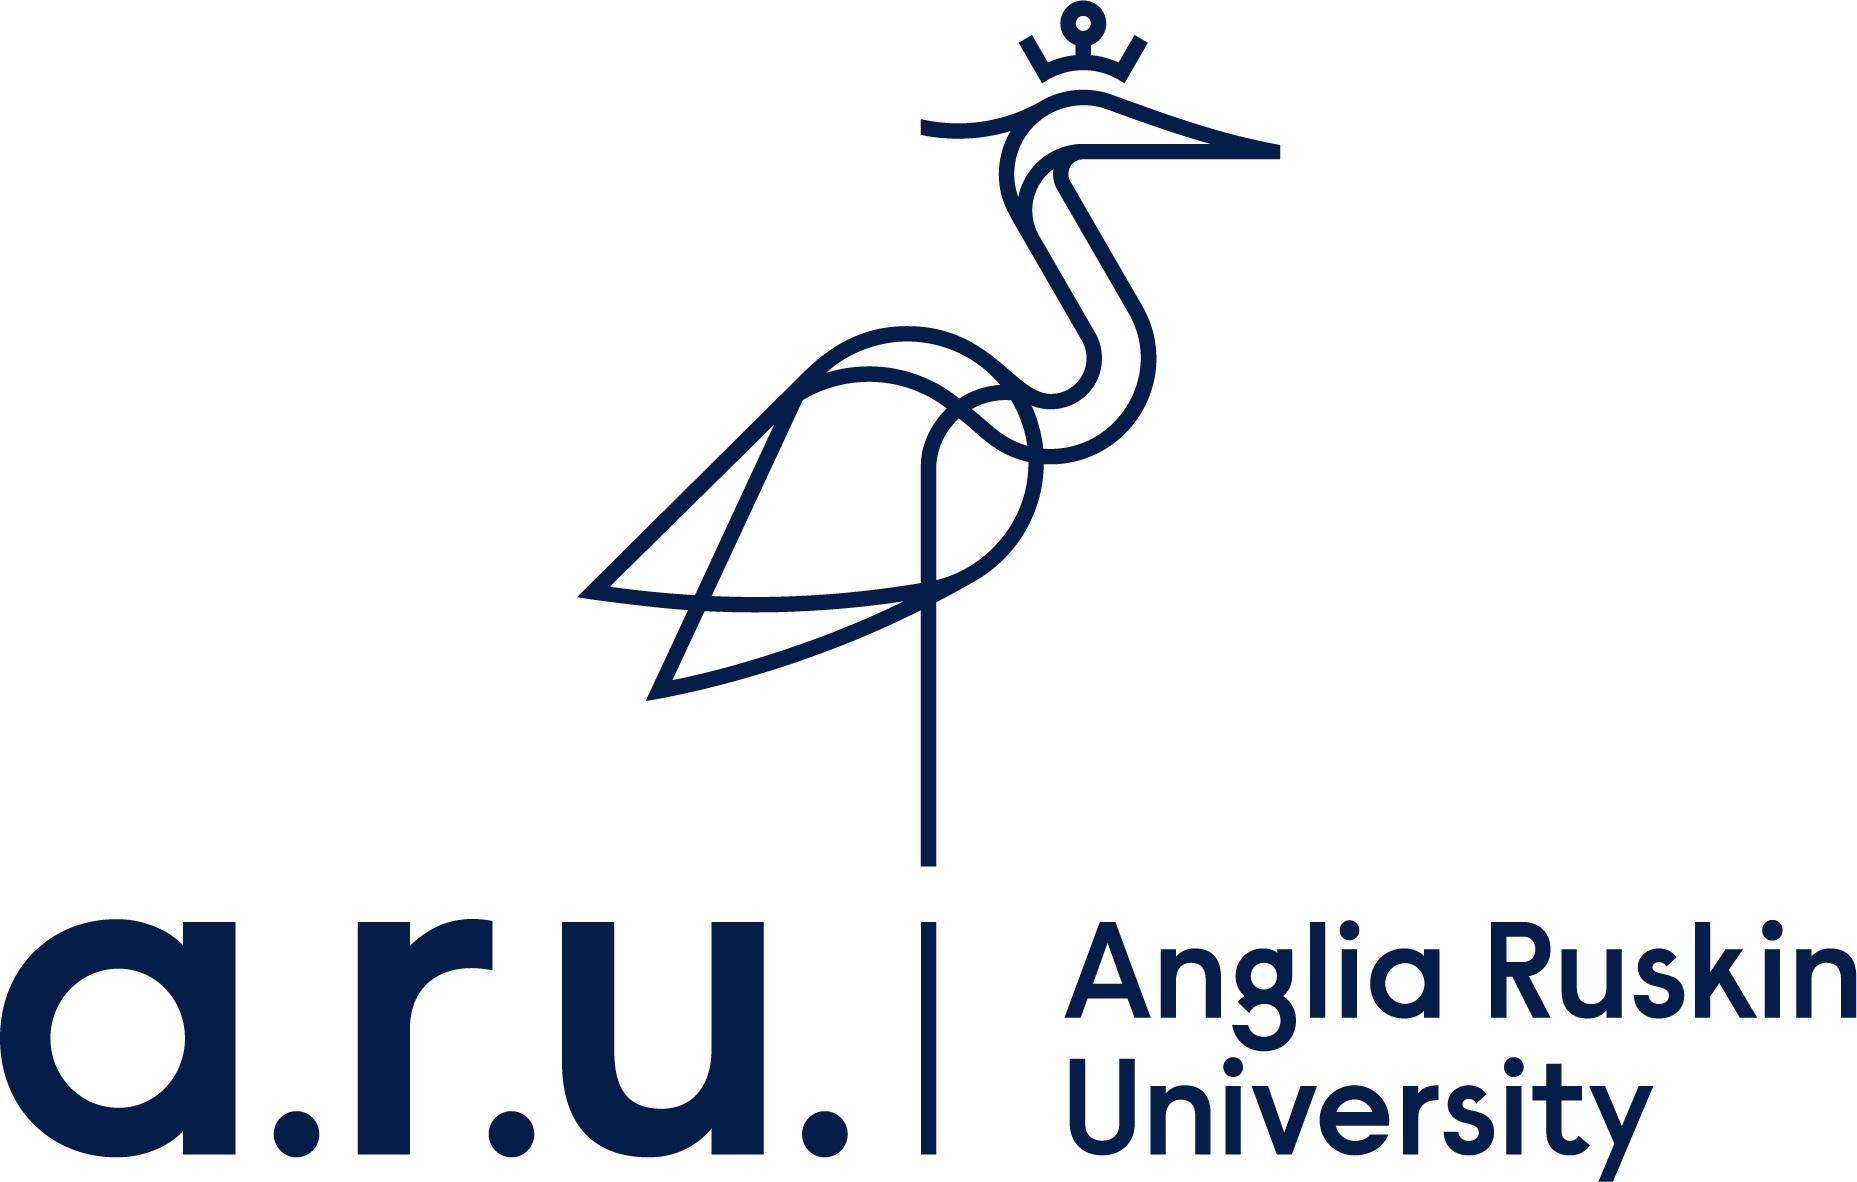 Anglia Ruskin University img-responsive